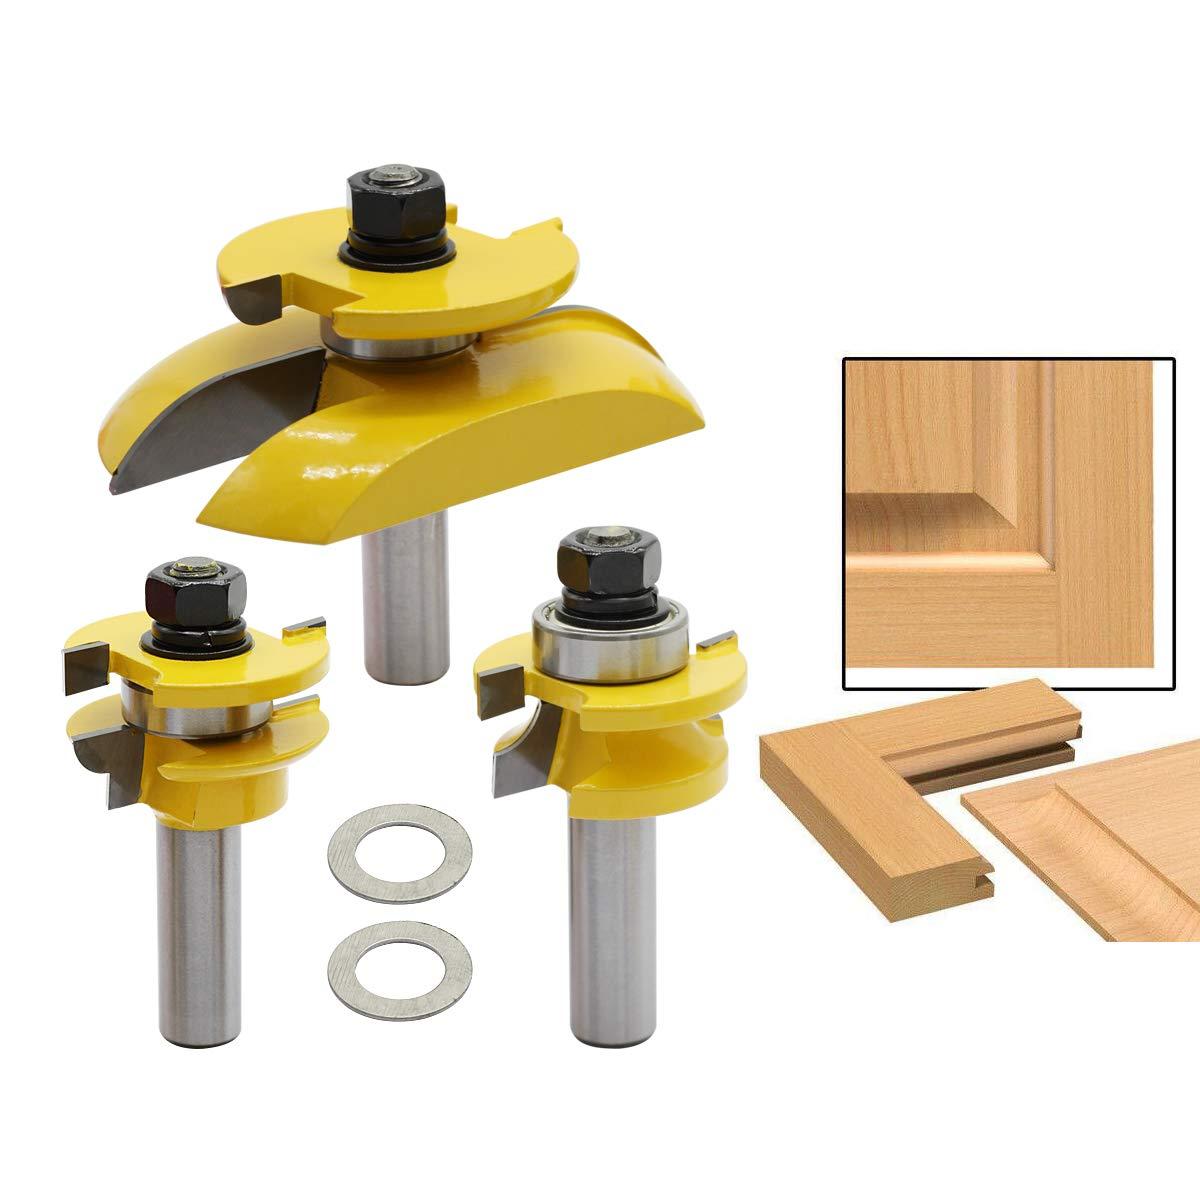 Nxtop 3Pcs 1/2'' Shank Rail Blade Cutter Panel Cabinet Router Bits Set Milling cutter Power Tools Door knife Wood Cutter